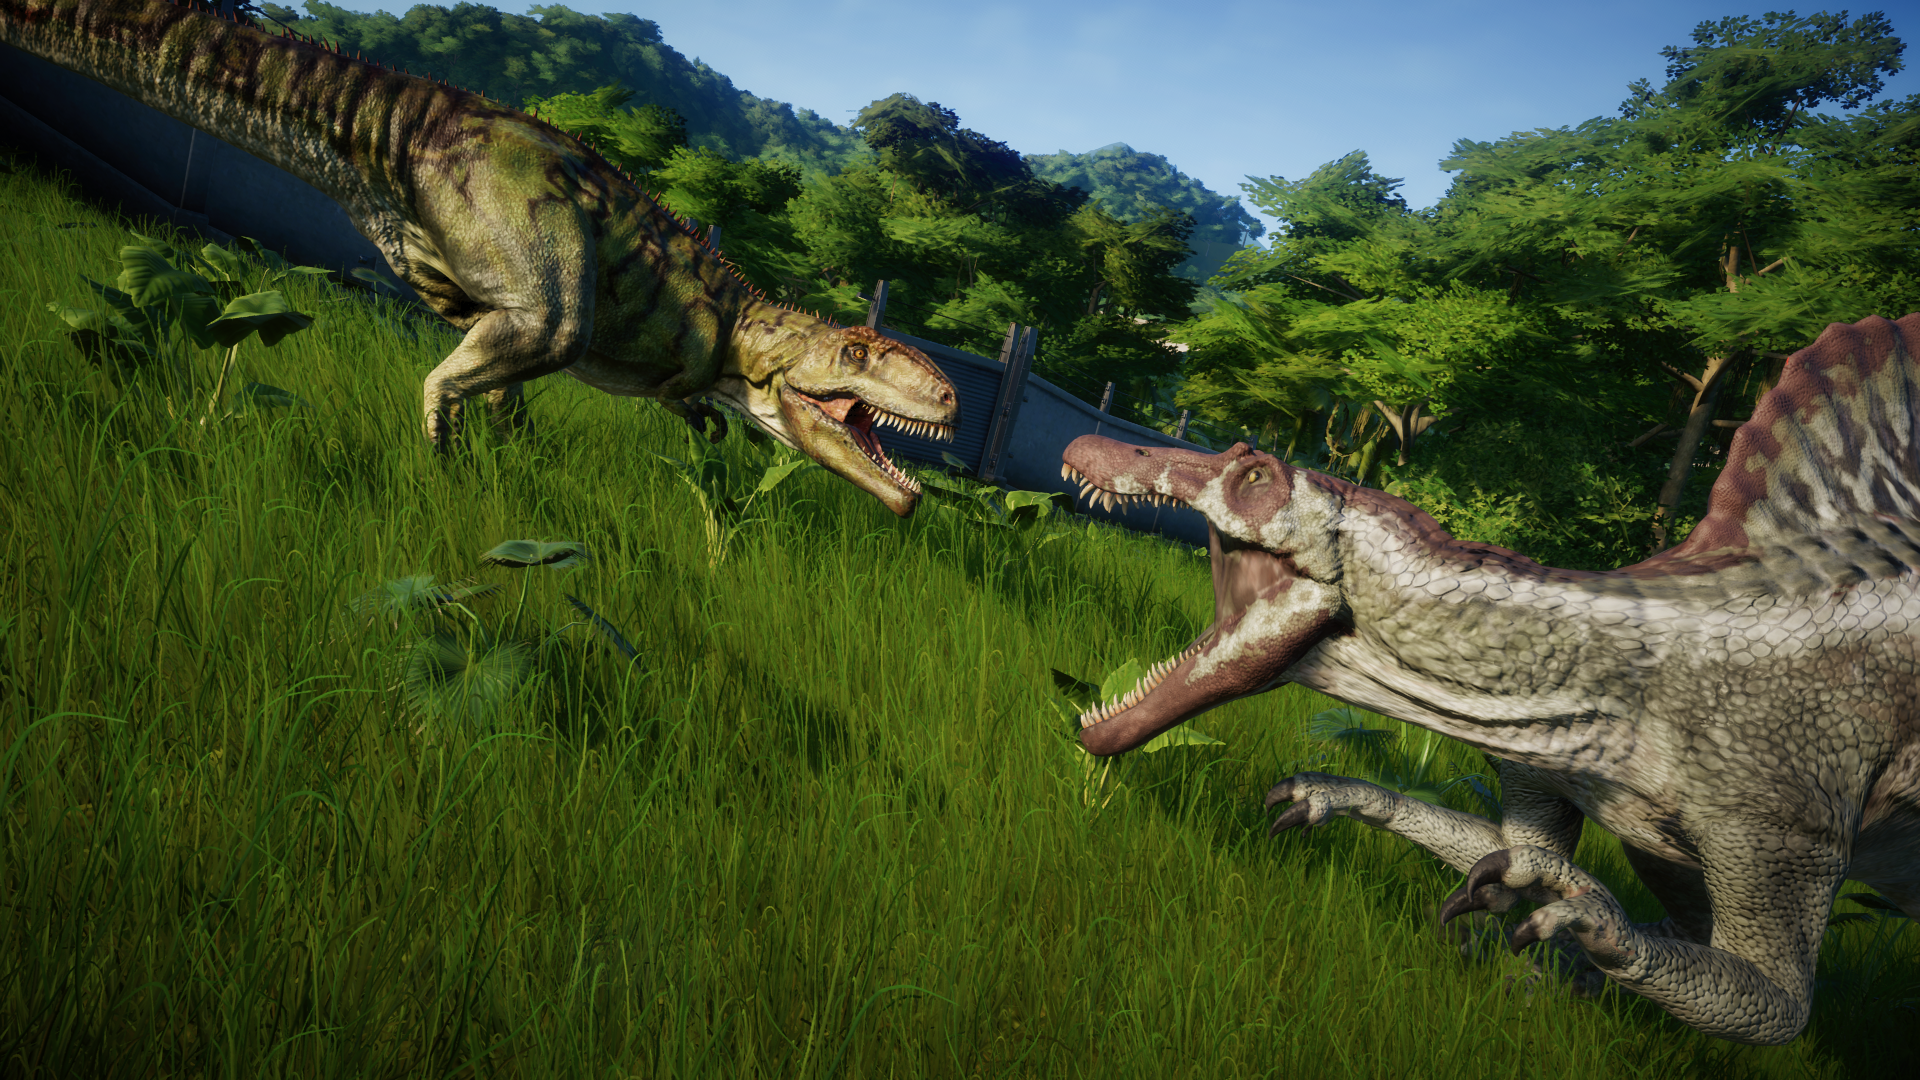 image giganotosaurus vs spinosaurus png jurassic world evolution